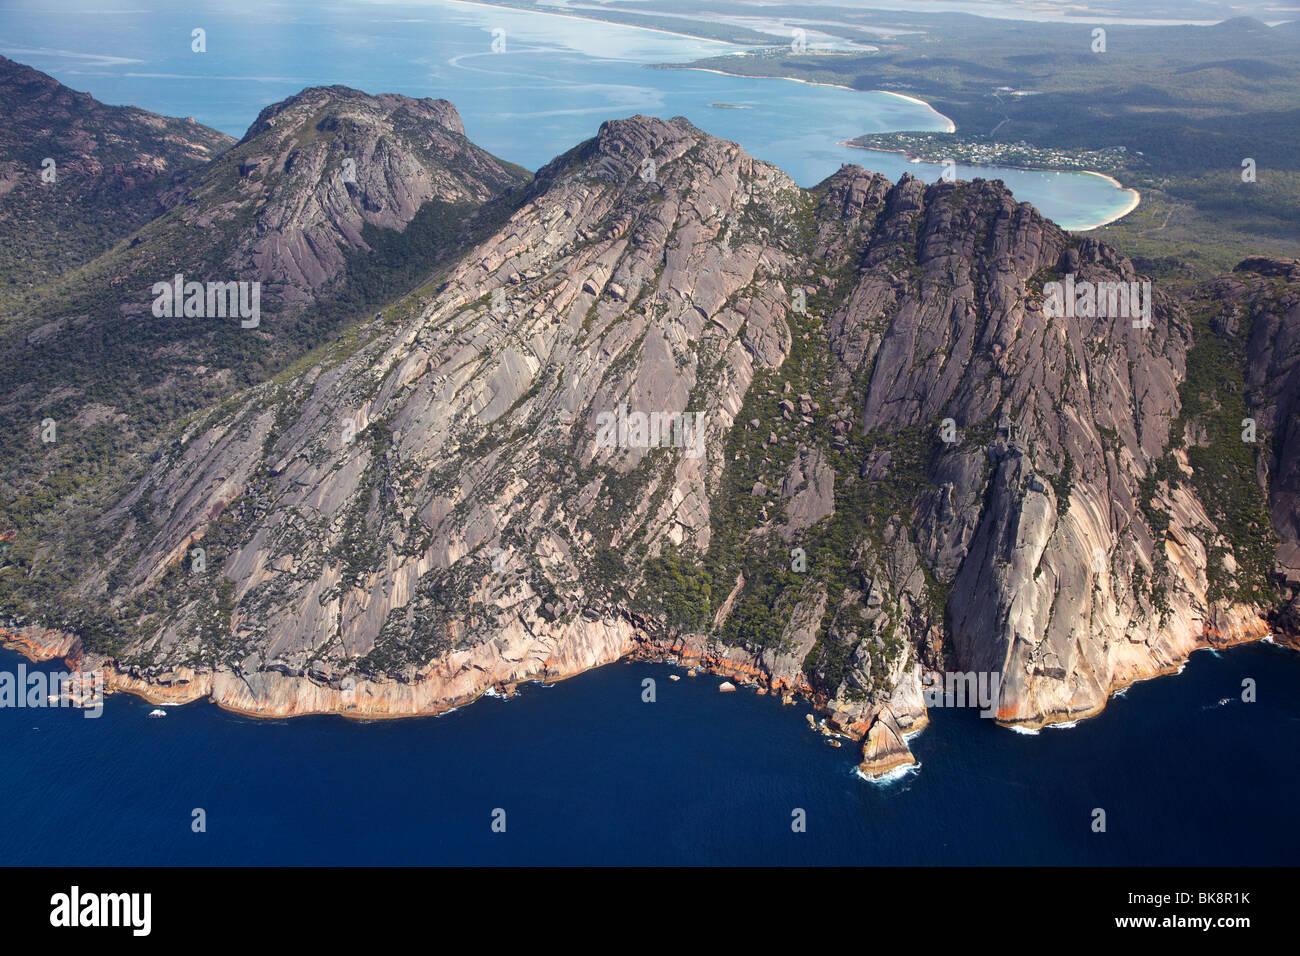 The Hazards, Freycinet National Park, Freycinet Peninsula, Eastern Tasmania, Australia - aerial - Stock Image